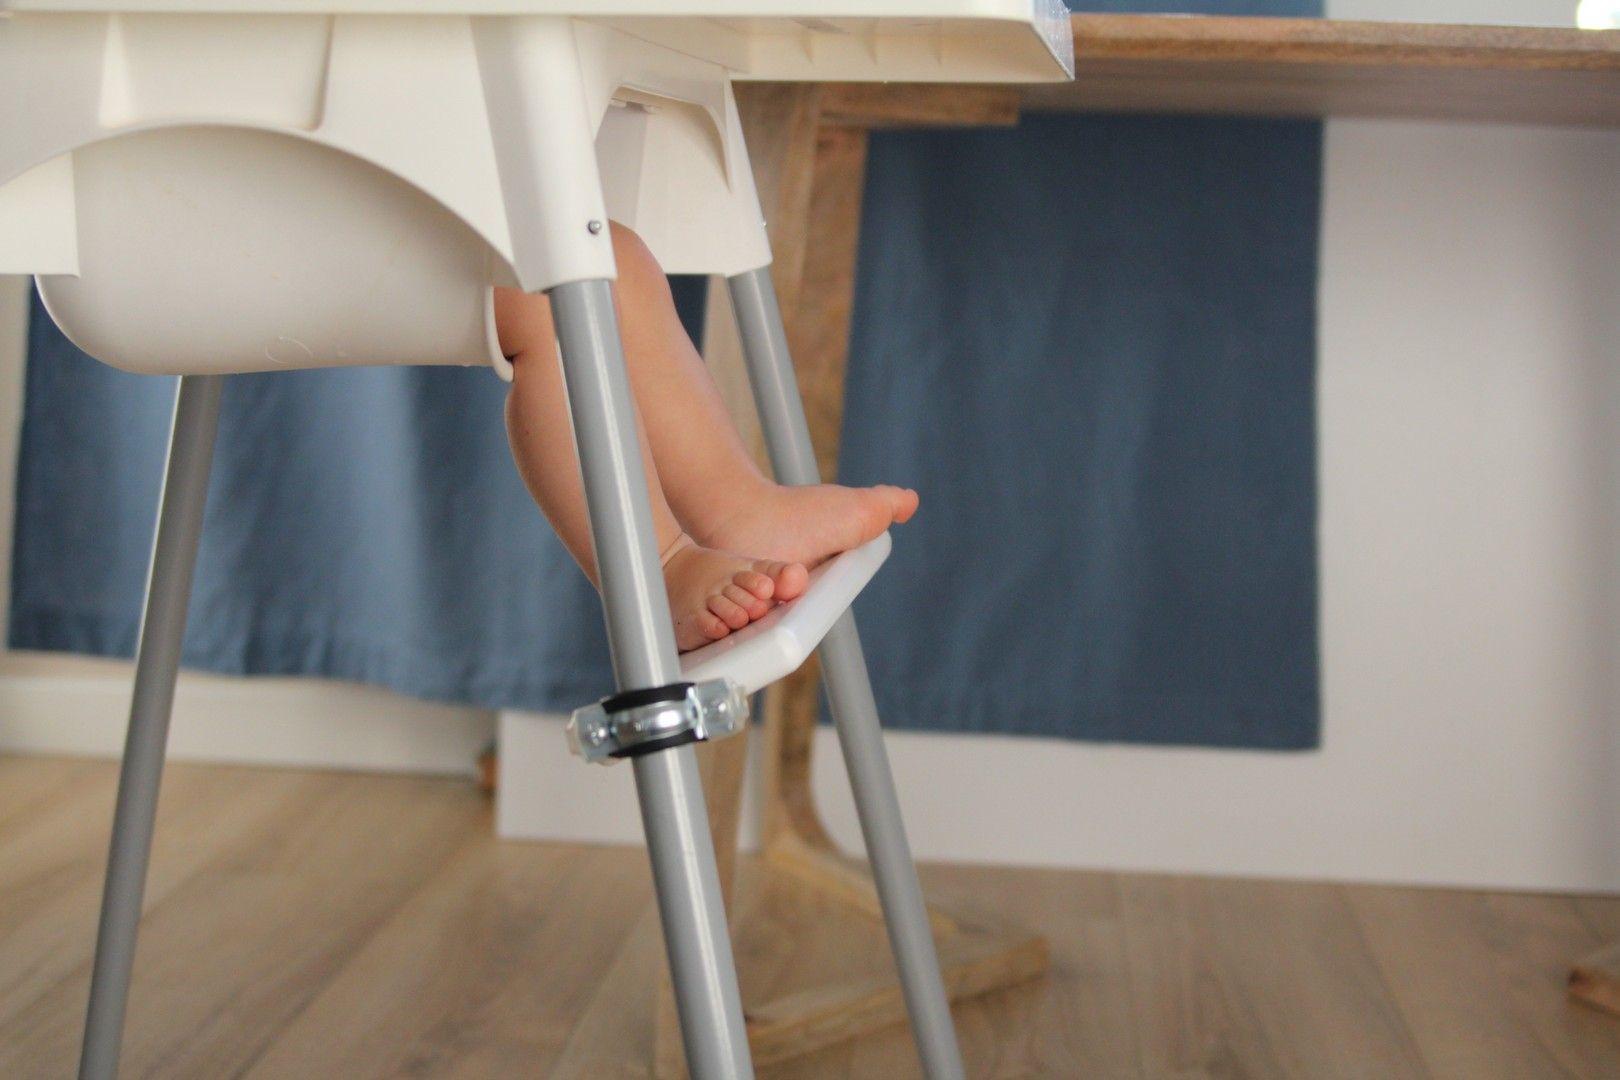 Stupendous Podnozek Do Krzeselka Ikea Antilop Aduu Pl Ikea High Caraccident5 Cool Chair Designs And Ideas Caraccident5Info